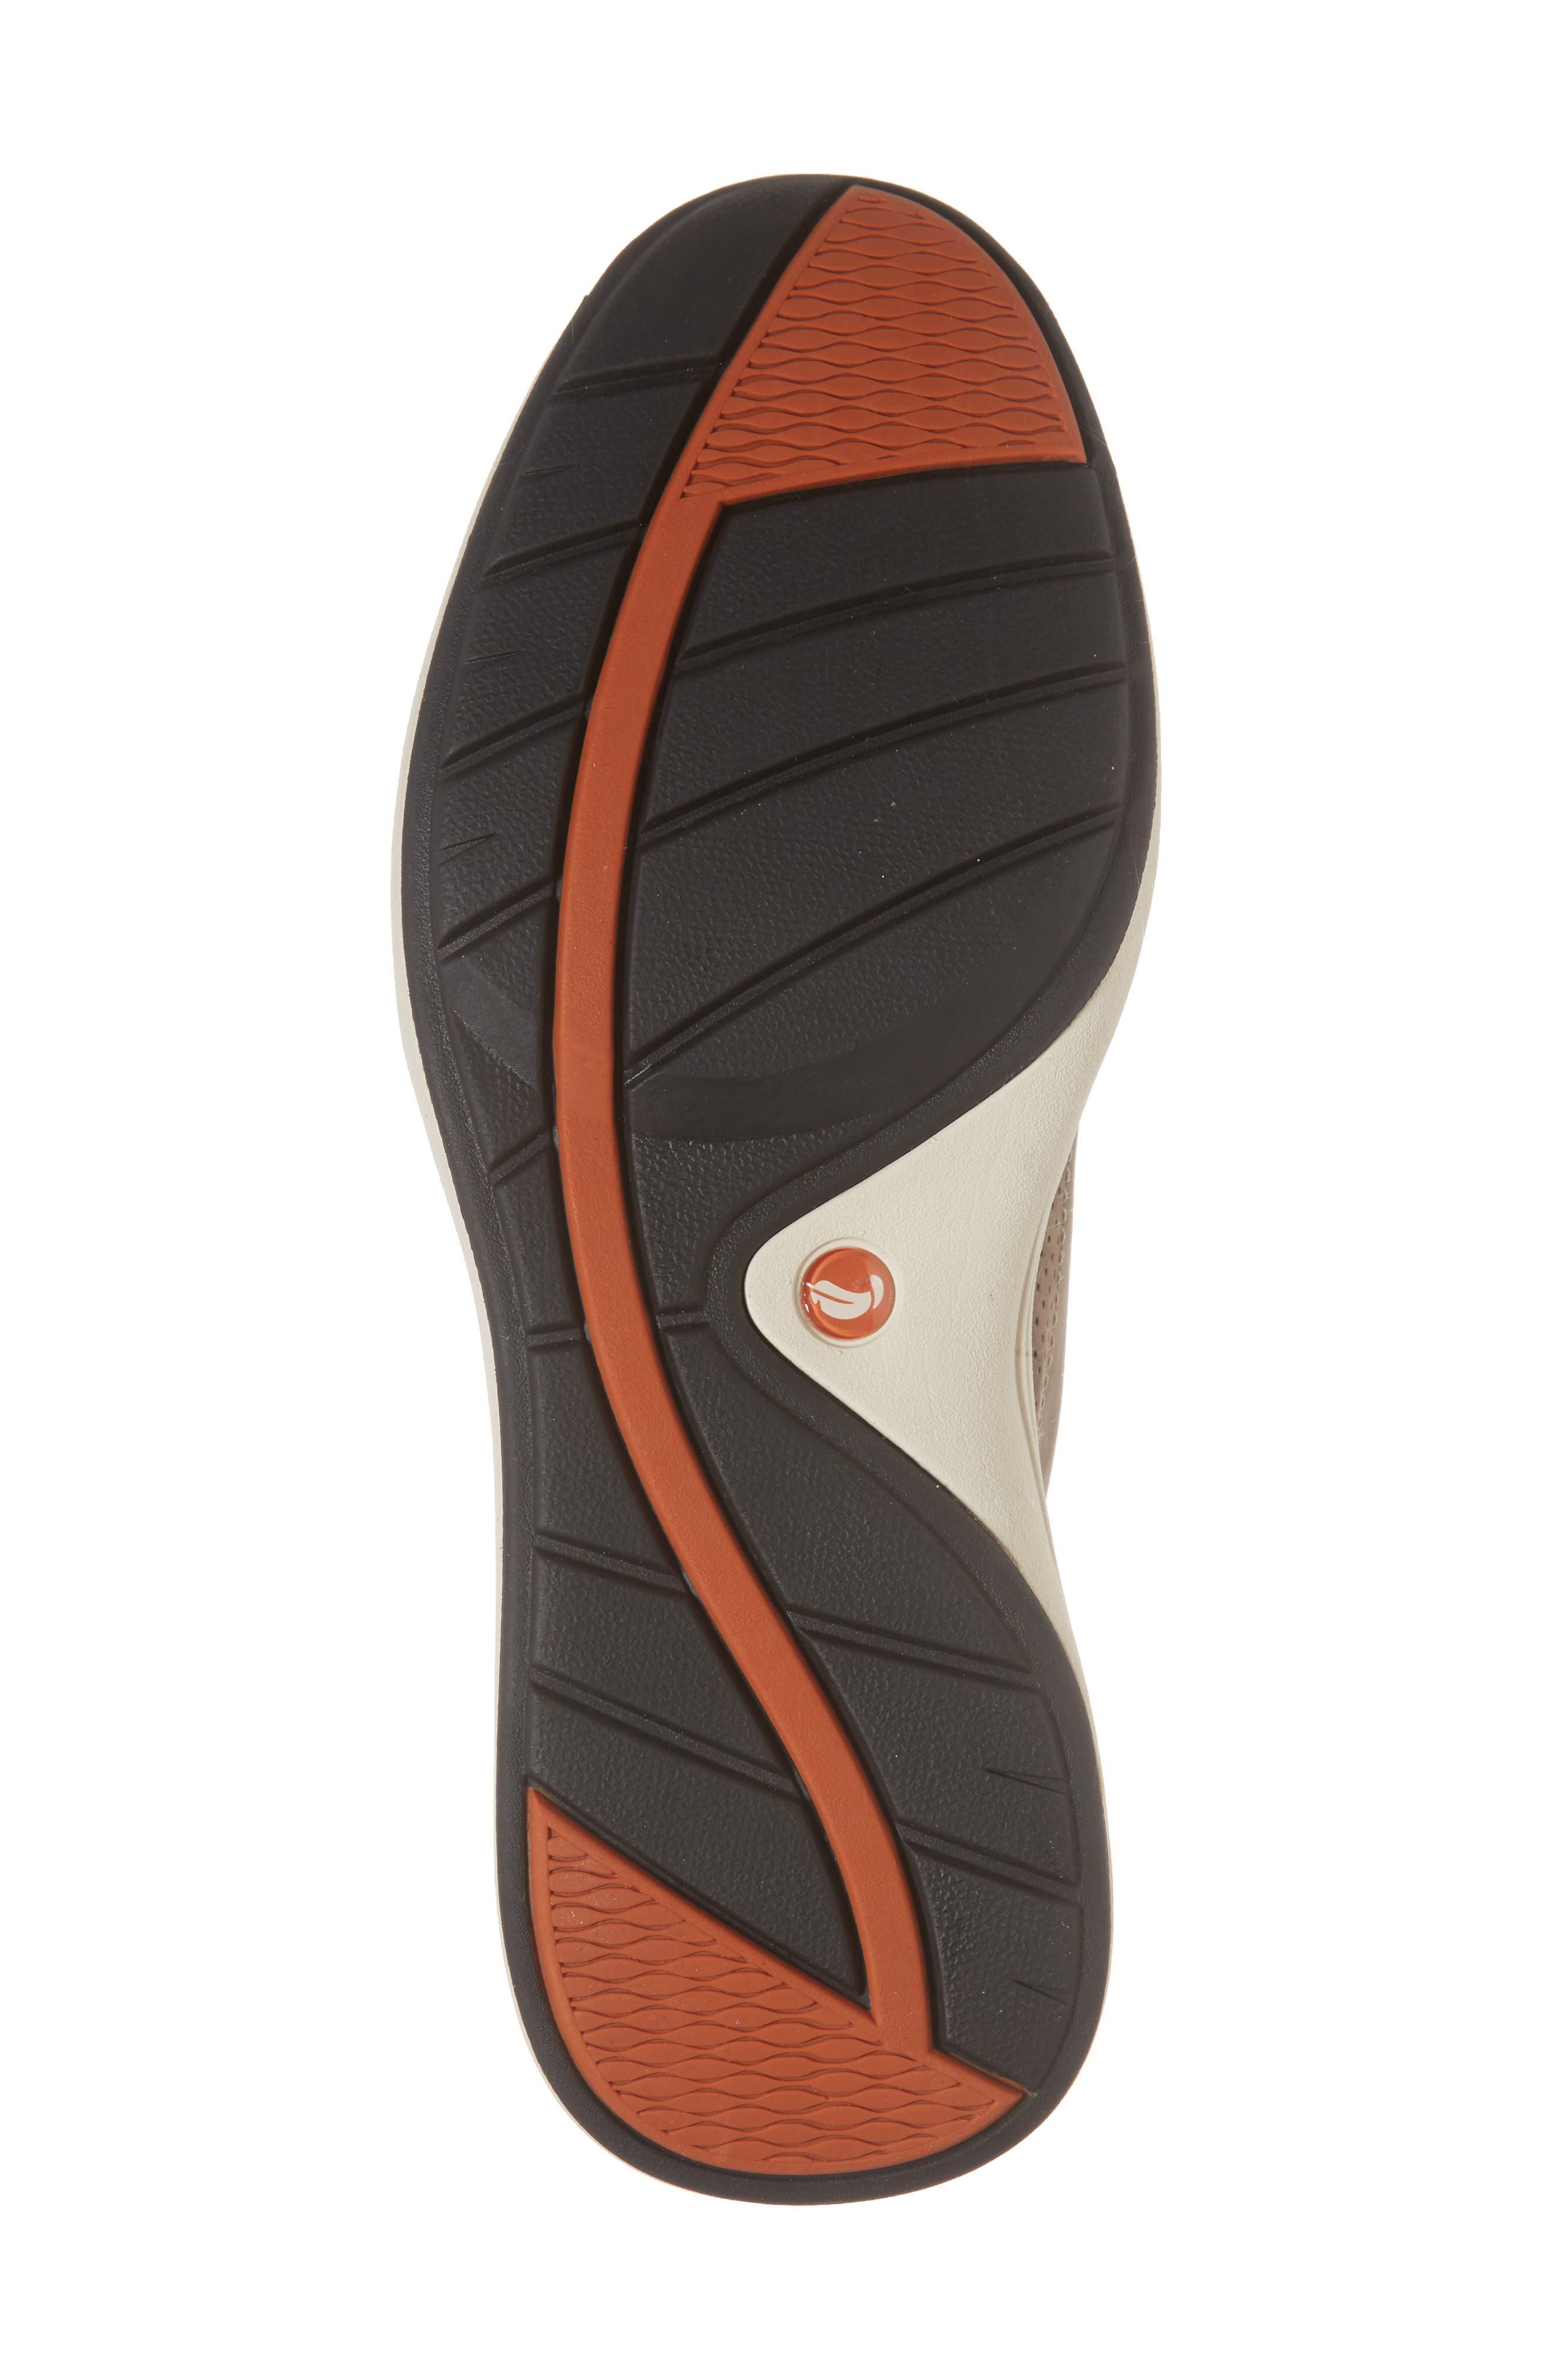 Clarks<sup>®</sup> Un Coast Low Top Sneaker,                             Alternate thumbnail 6, color,                             Taupe Nubuck